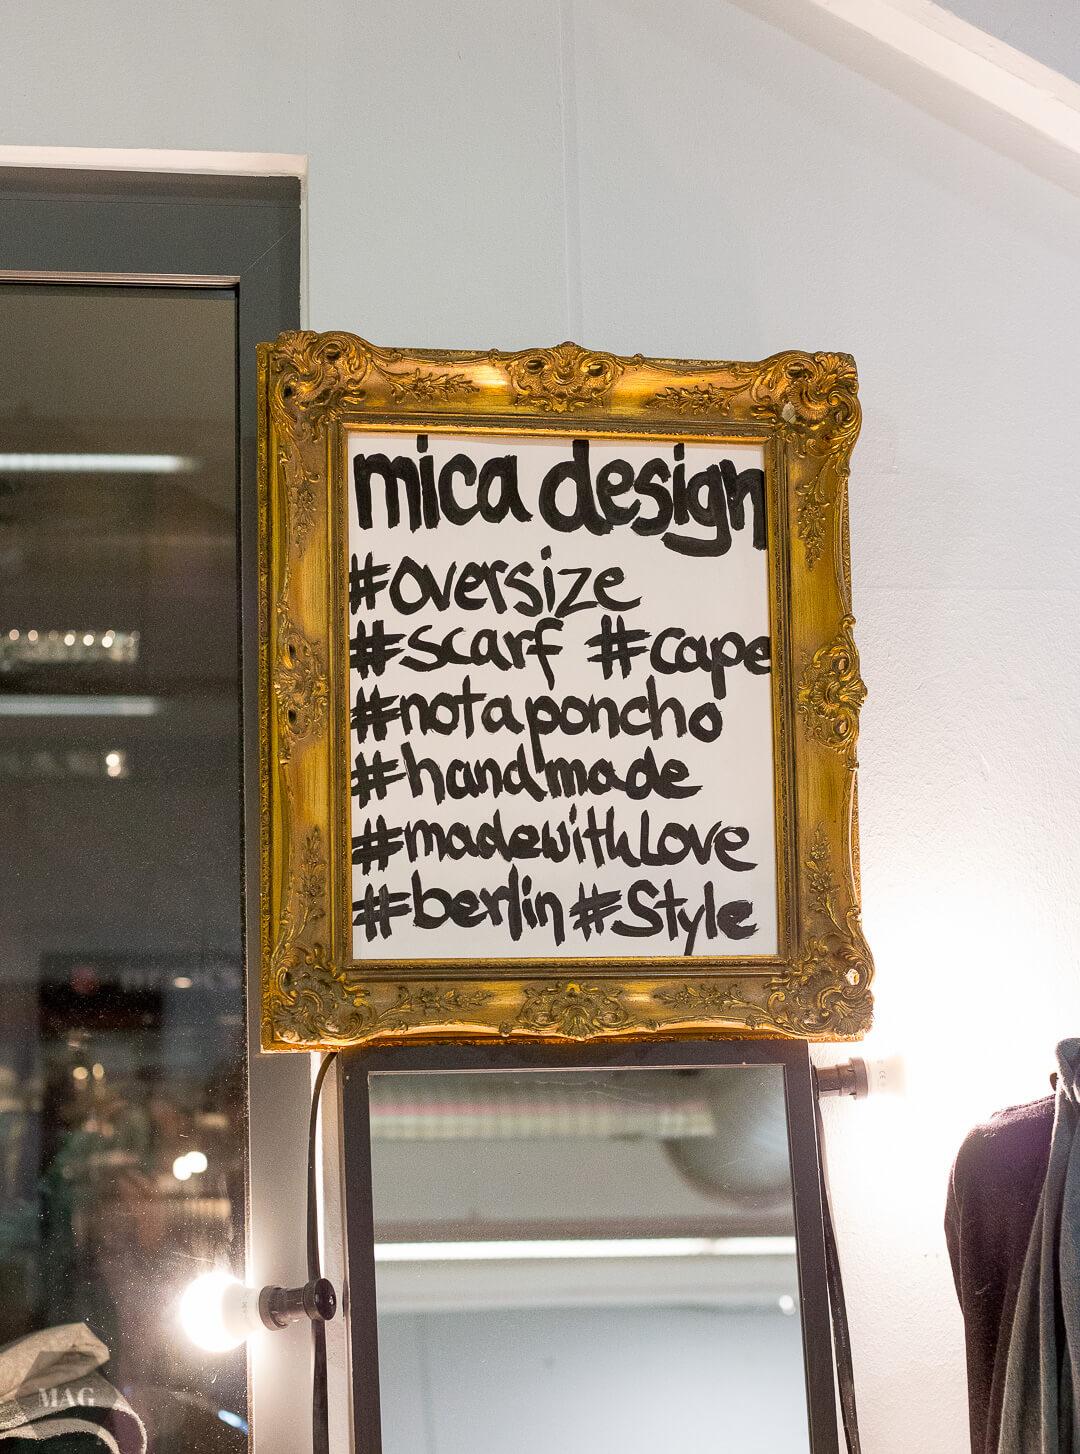 Design Gipfel Münster, Designgipfel Münster, Designgipfel, Design Messe, Design Ausstellung Münster, Design Markt, Design Markt Münster, Designgipfel Aussteller, Designmarkt Münster, Design Gipfel